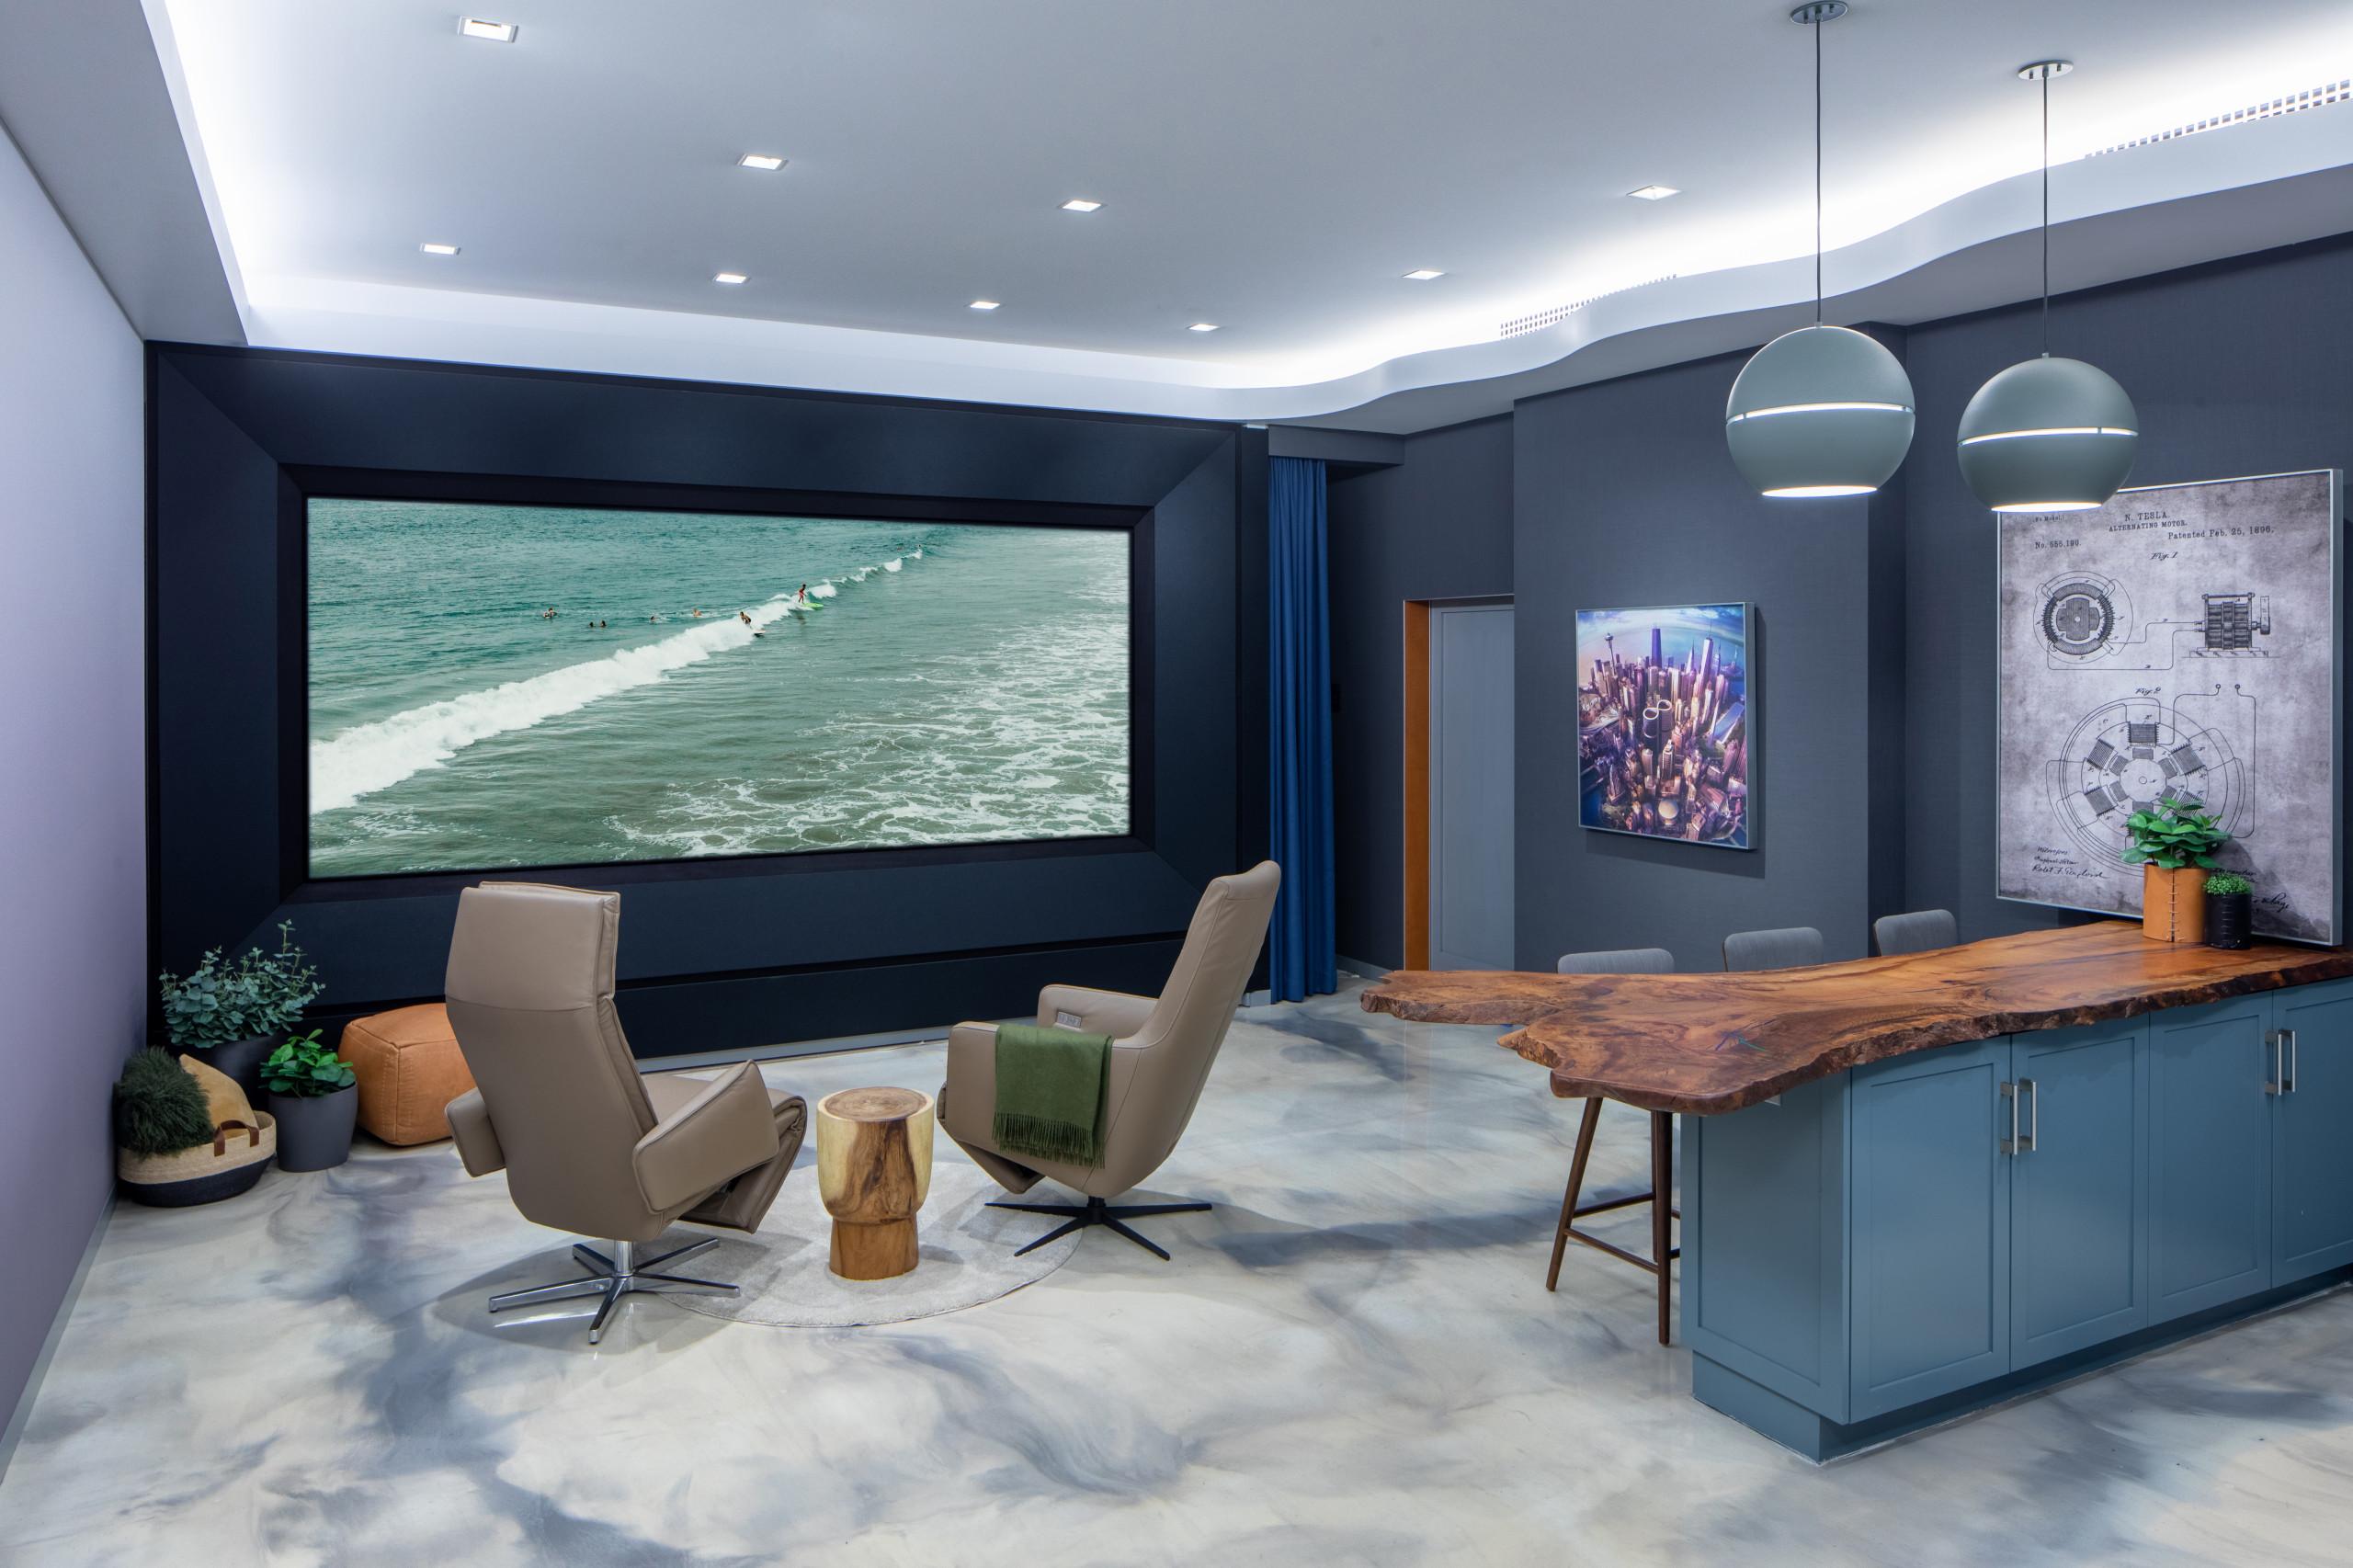 Indoor Technology